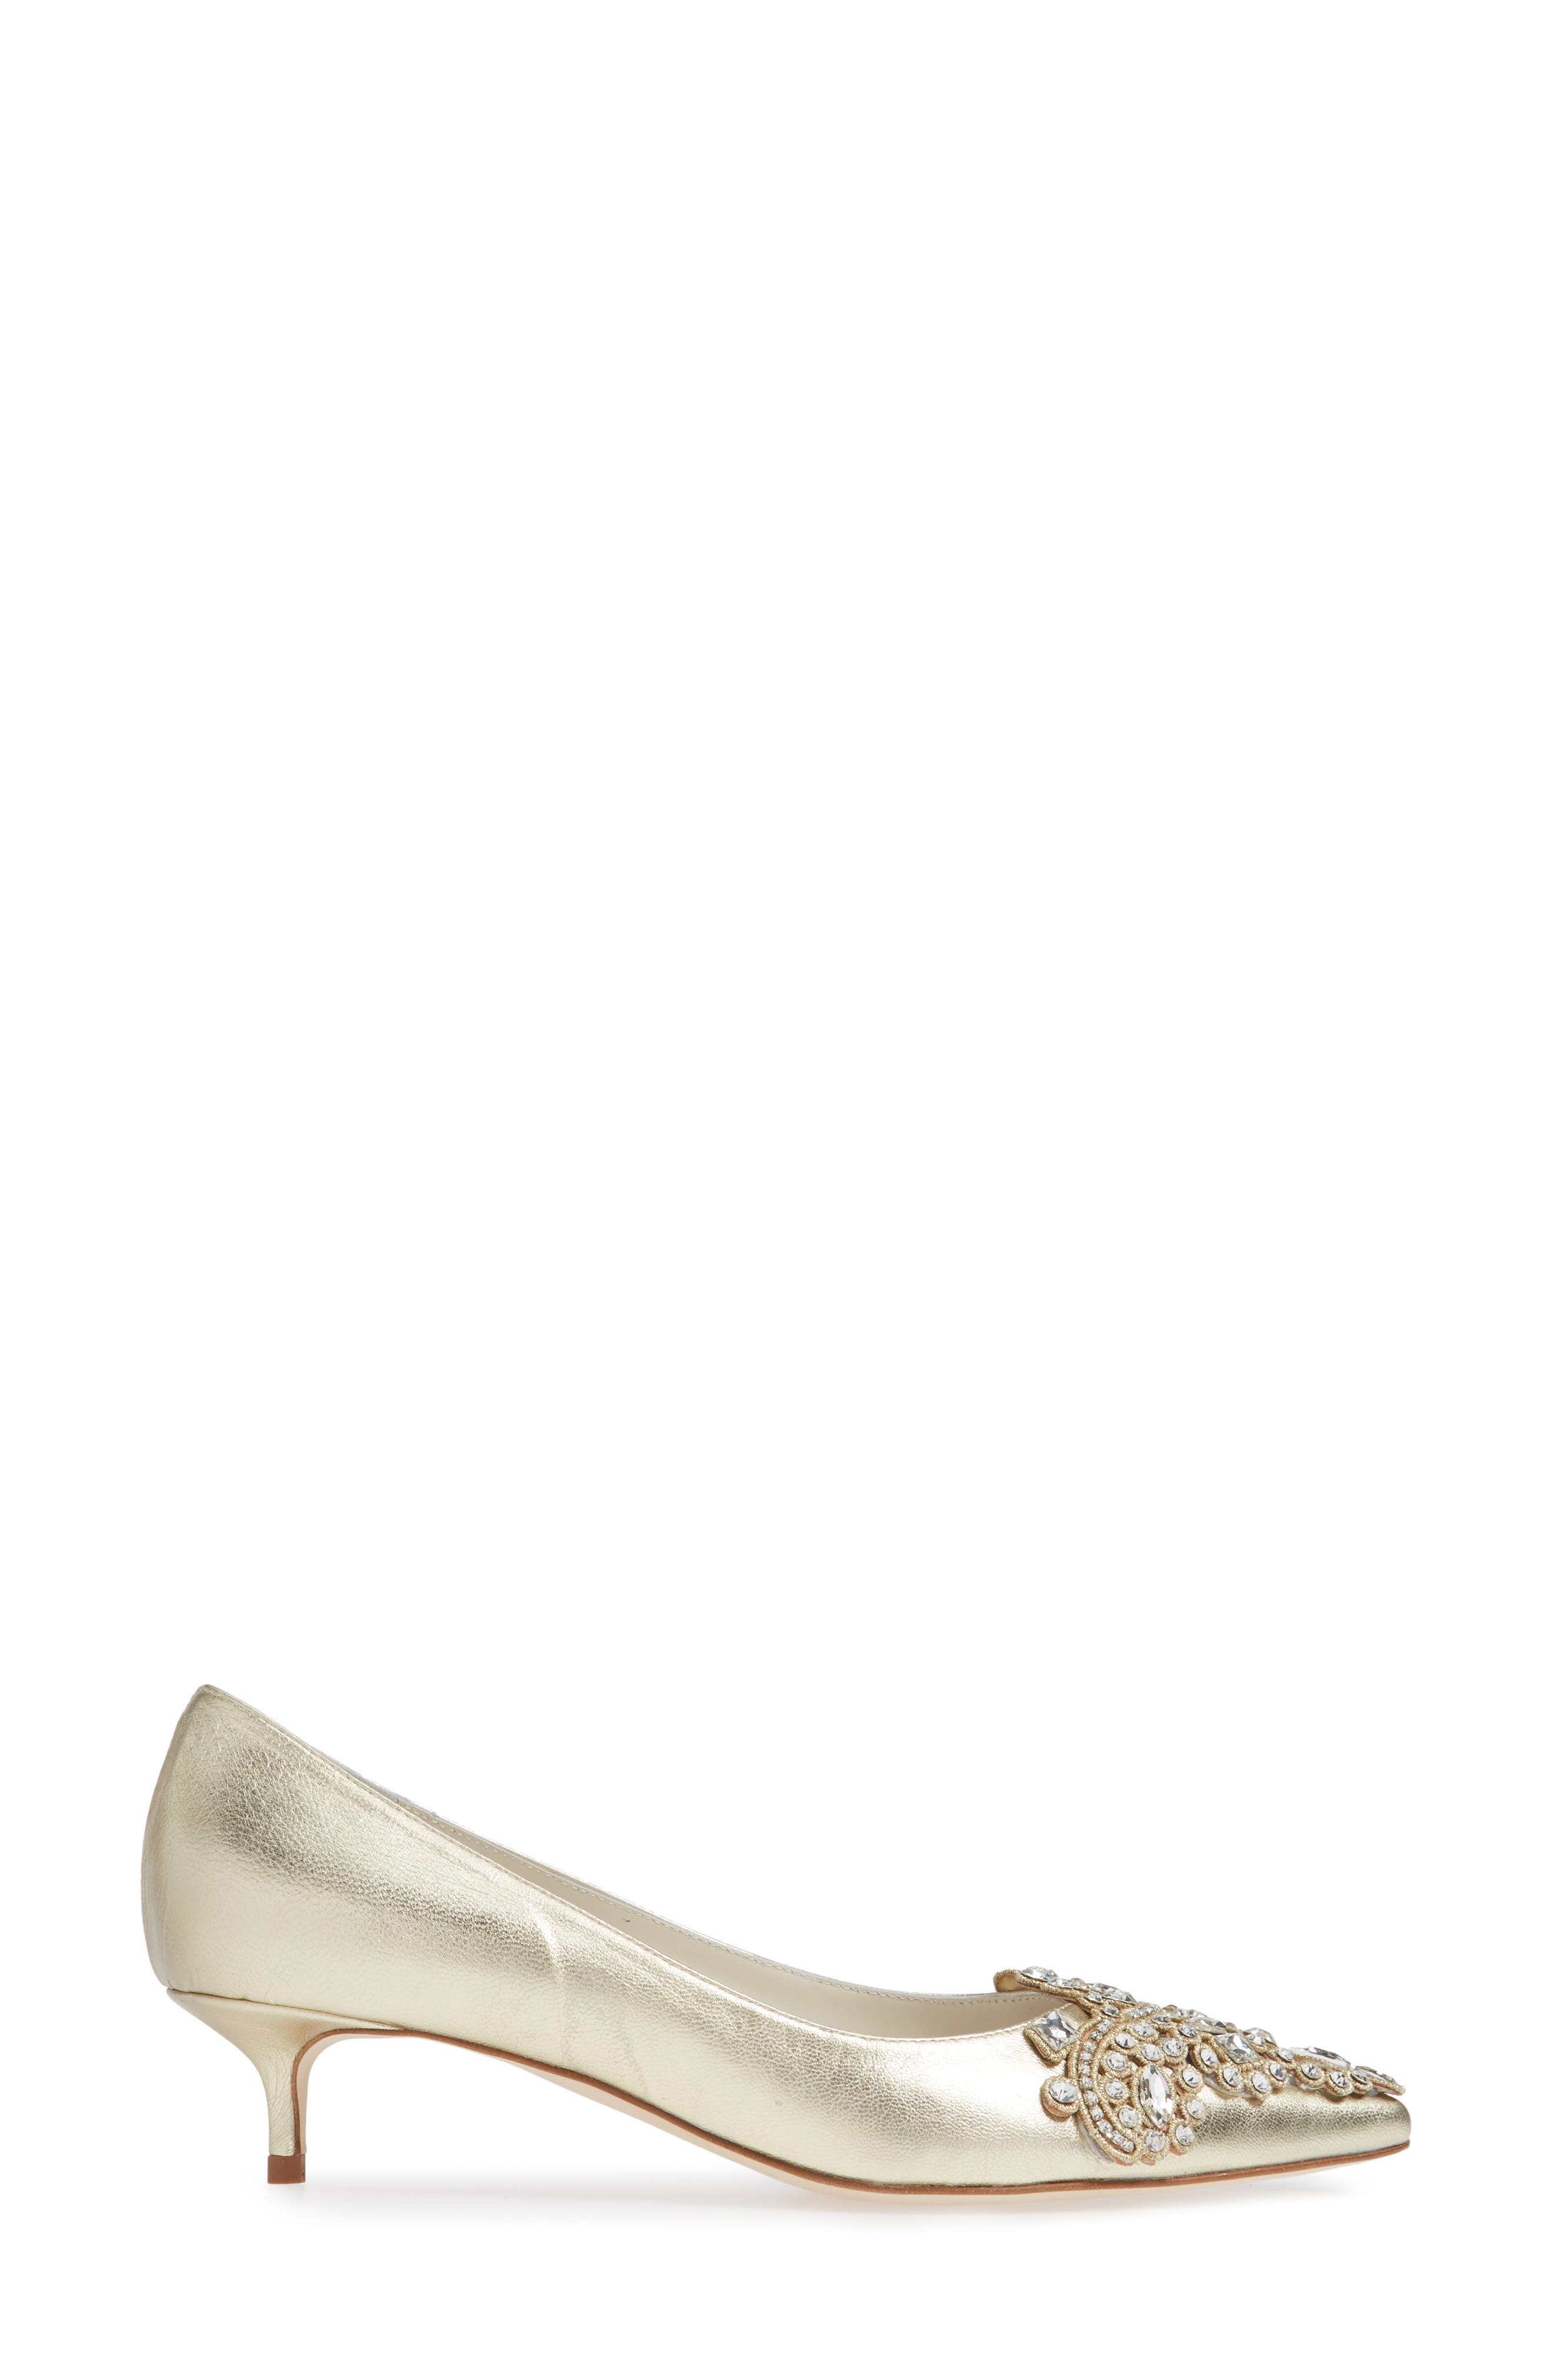 SOMETHING BLEU, Brinsley Embellished Pointy Toe Pump, Alternate thumbnail 3, color, PLATINO NAPPA